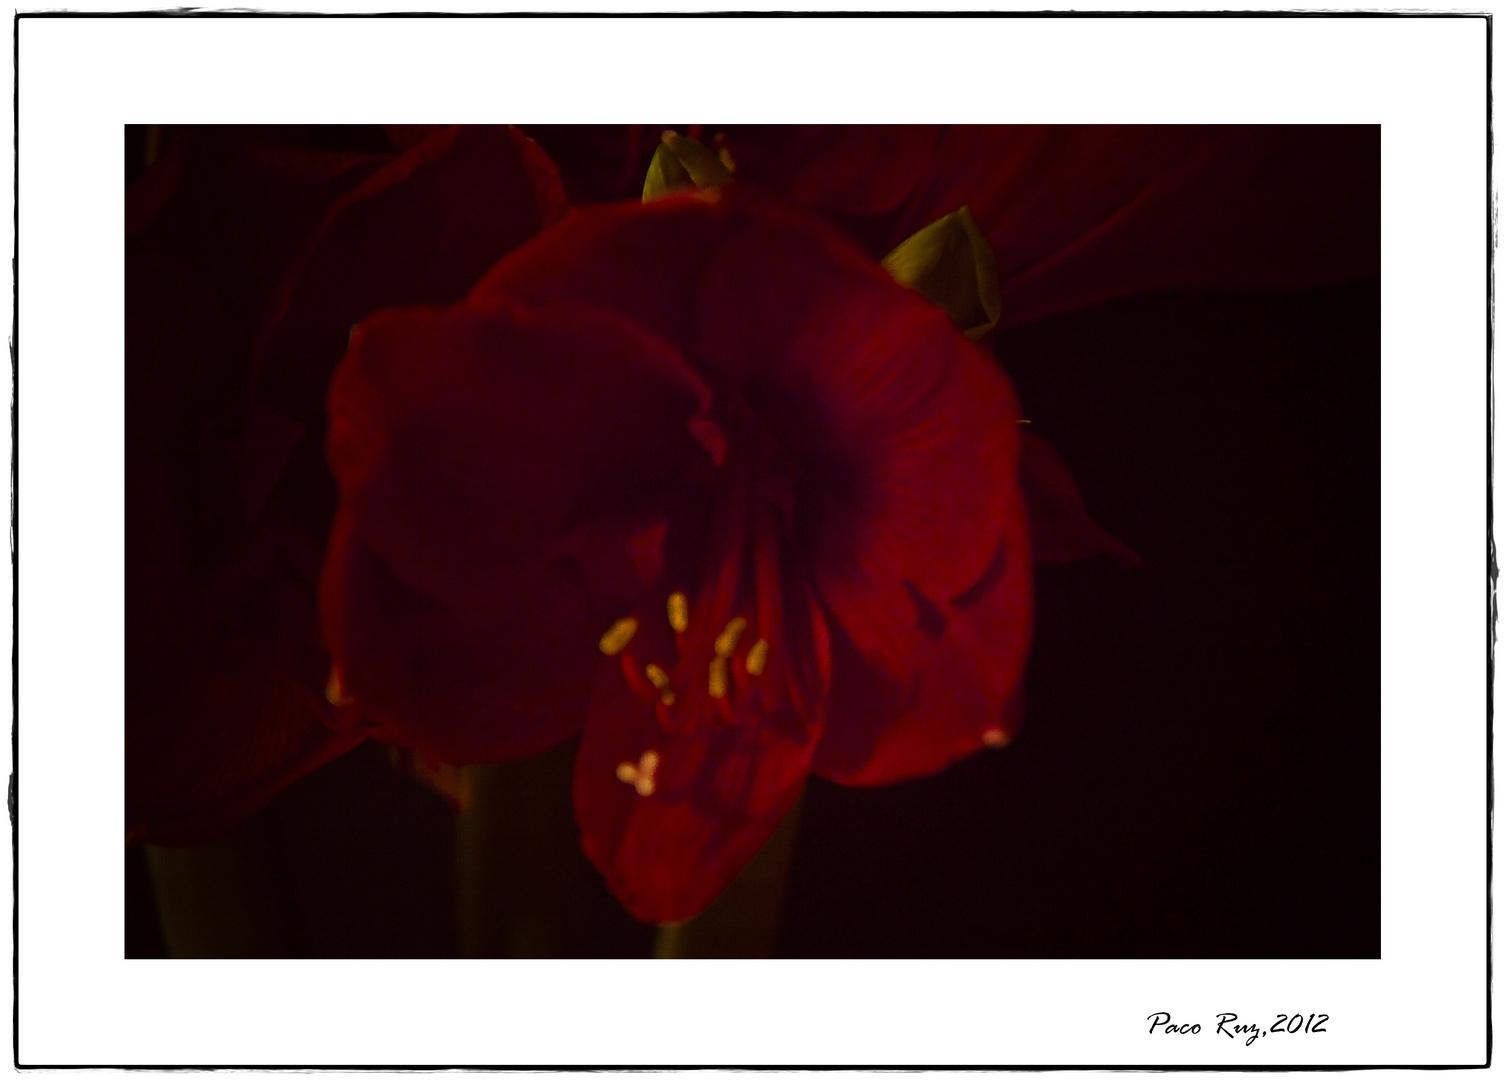 Amarilis Roja